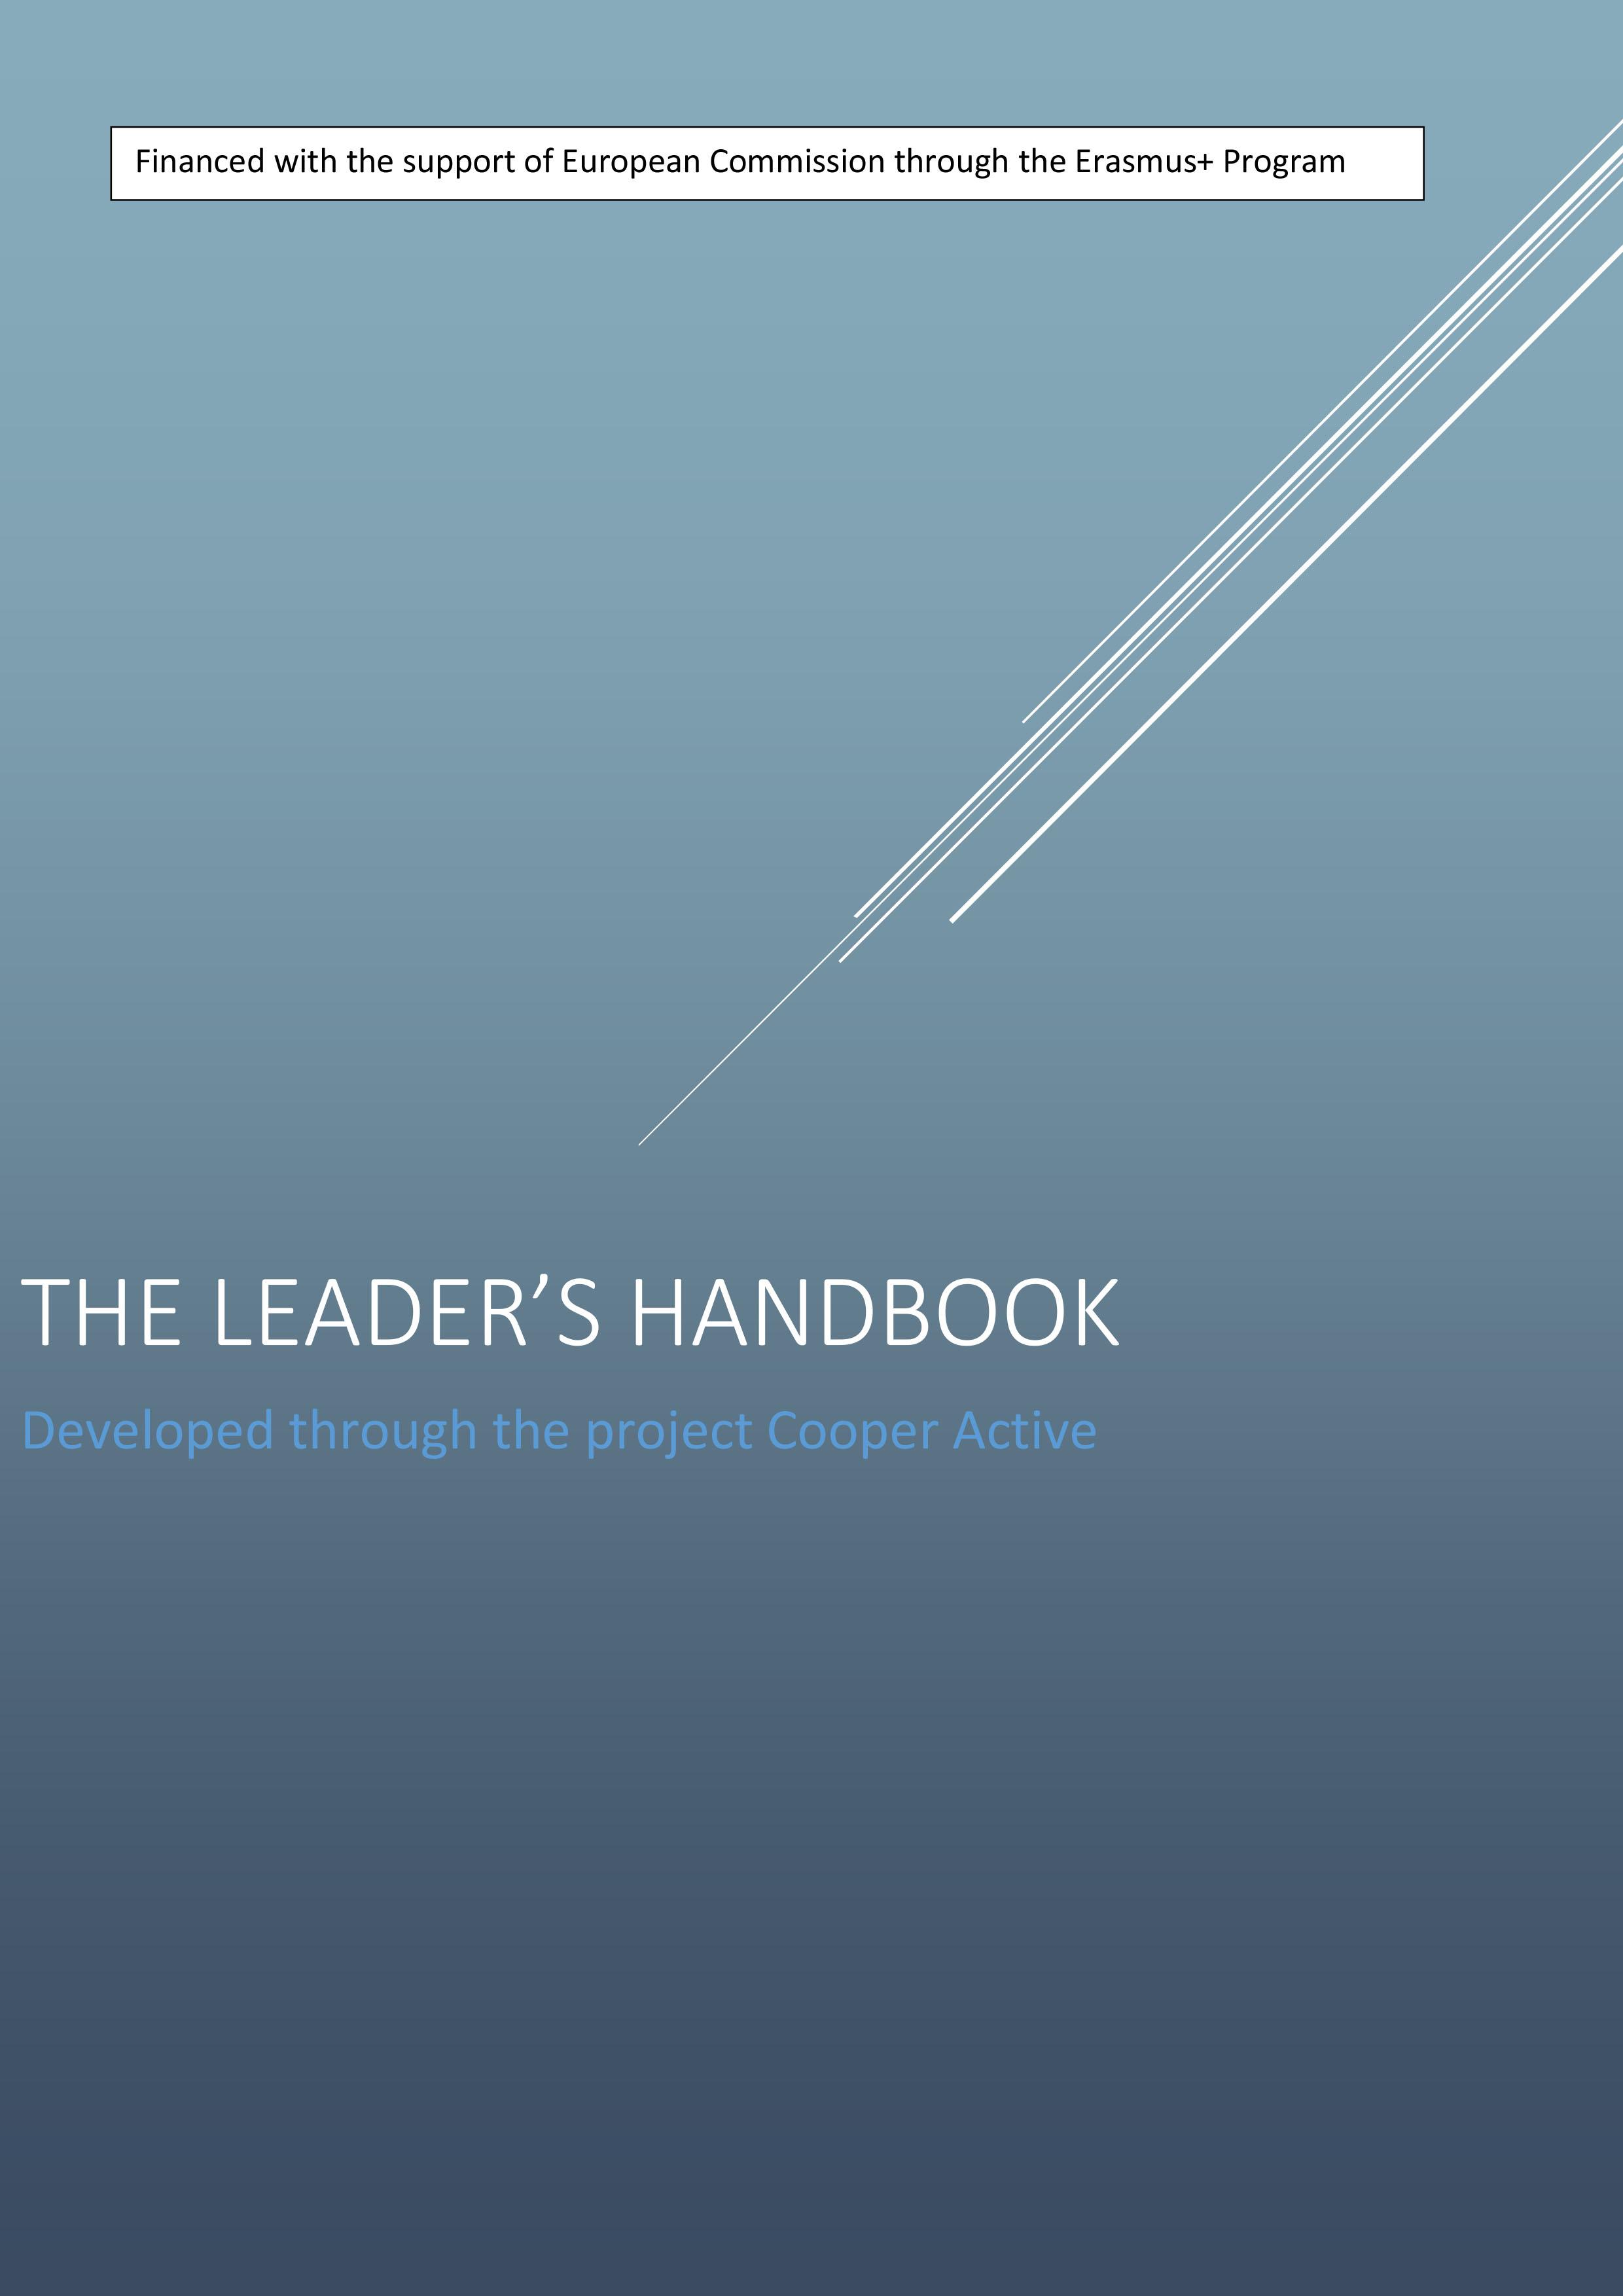 LeaderHandsbook